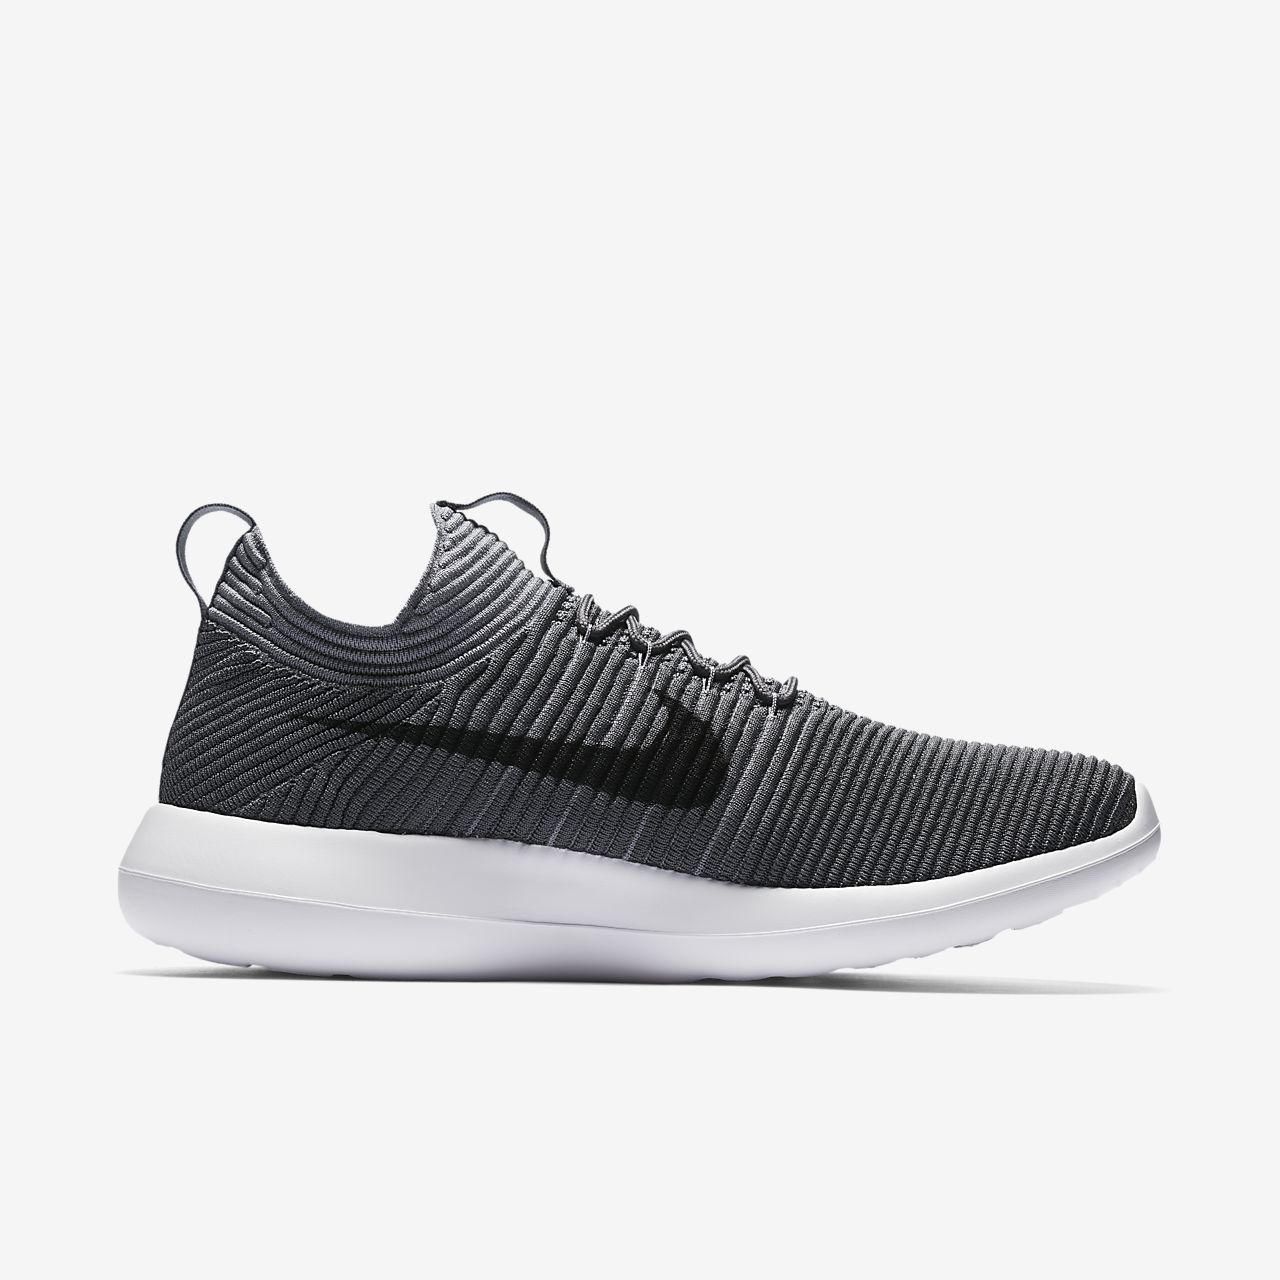 Chaussure Nike Blazer Personnalisé Synonyme